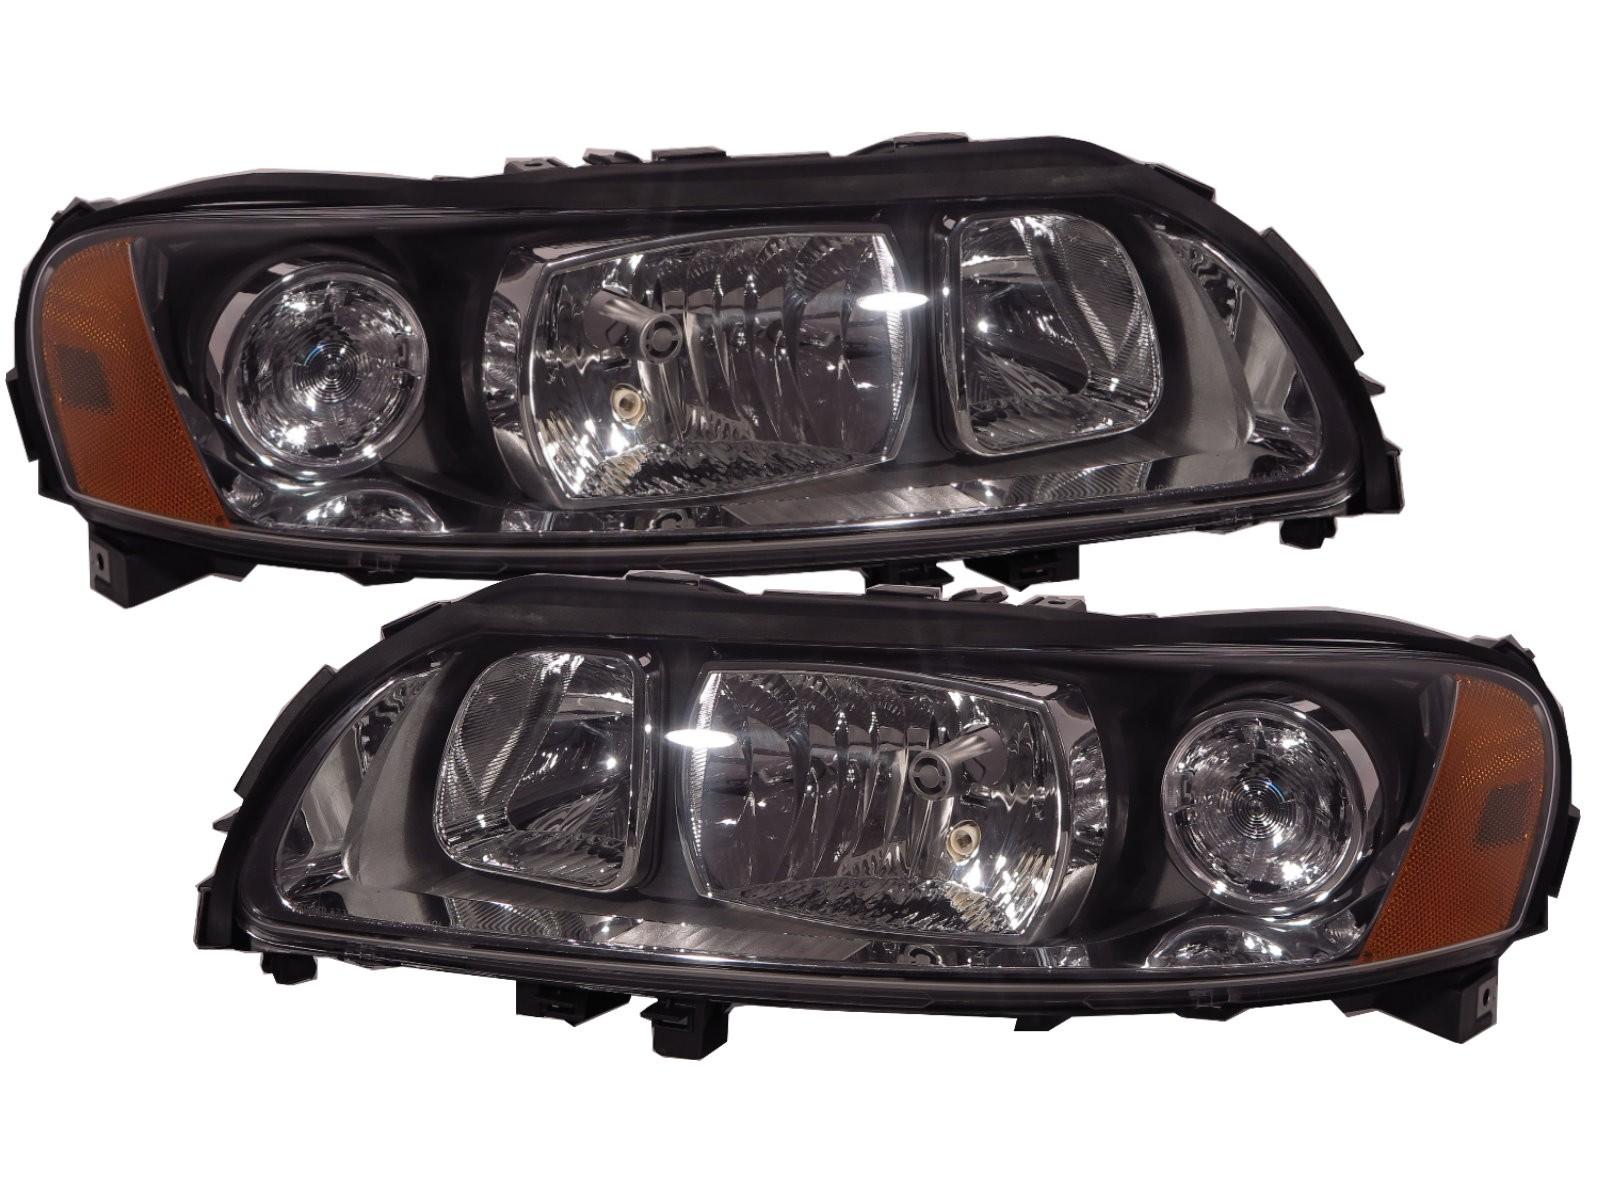 CrazyTheGod S60 First generation 2004-2009 Sedan 4D Halogen Headlight Headlamp Black for VOLVO LHD